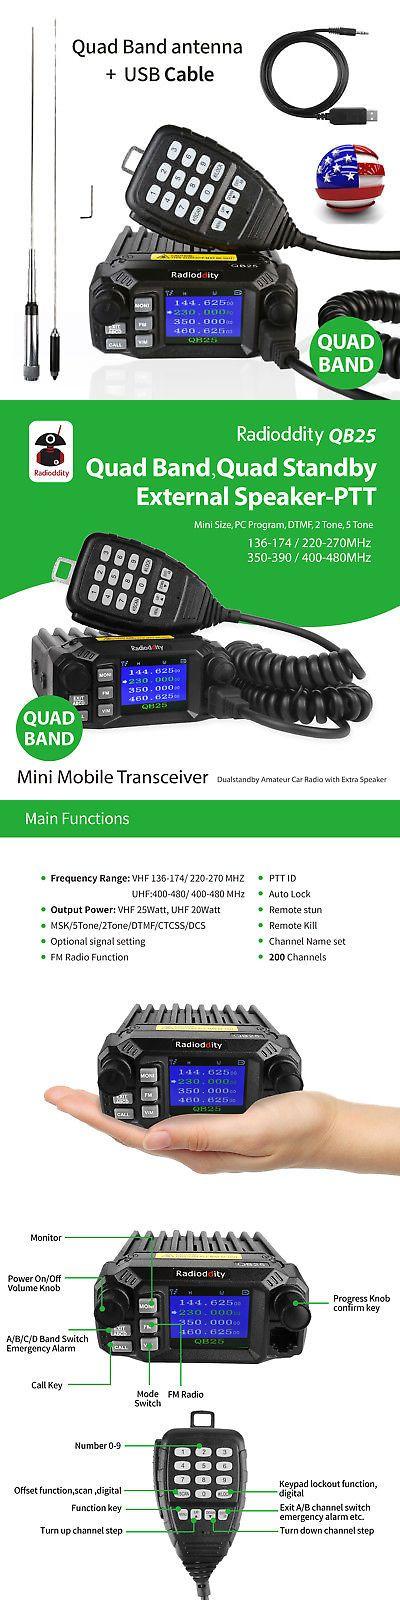 Ham Radio Transceivers: Radioddity Qb25 Pro Quad Band Mobile Car Radio Transceiver V Uhf 25W +Antenna Us -> BUY IT NOW ONLY: $118.99 on eBay!